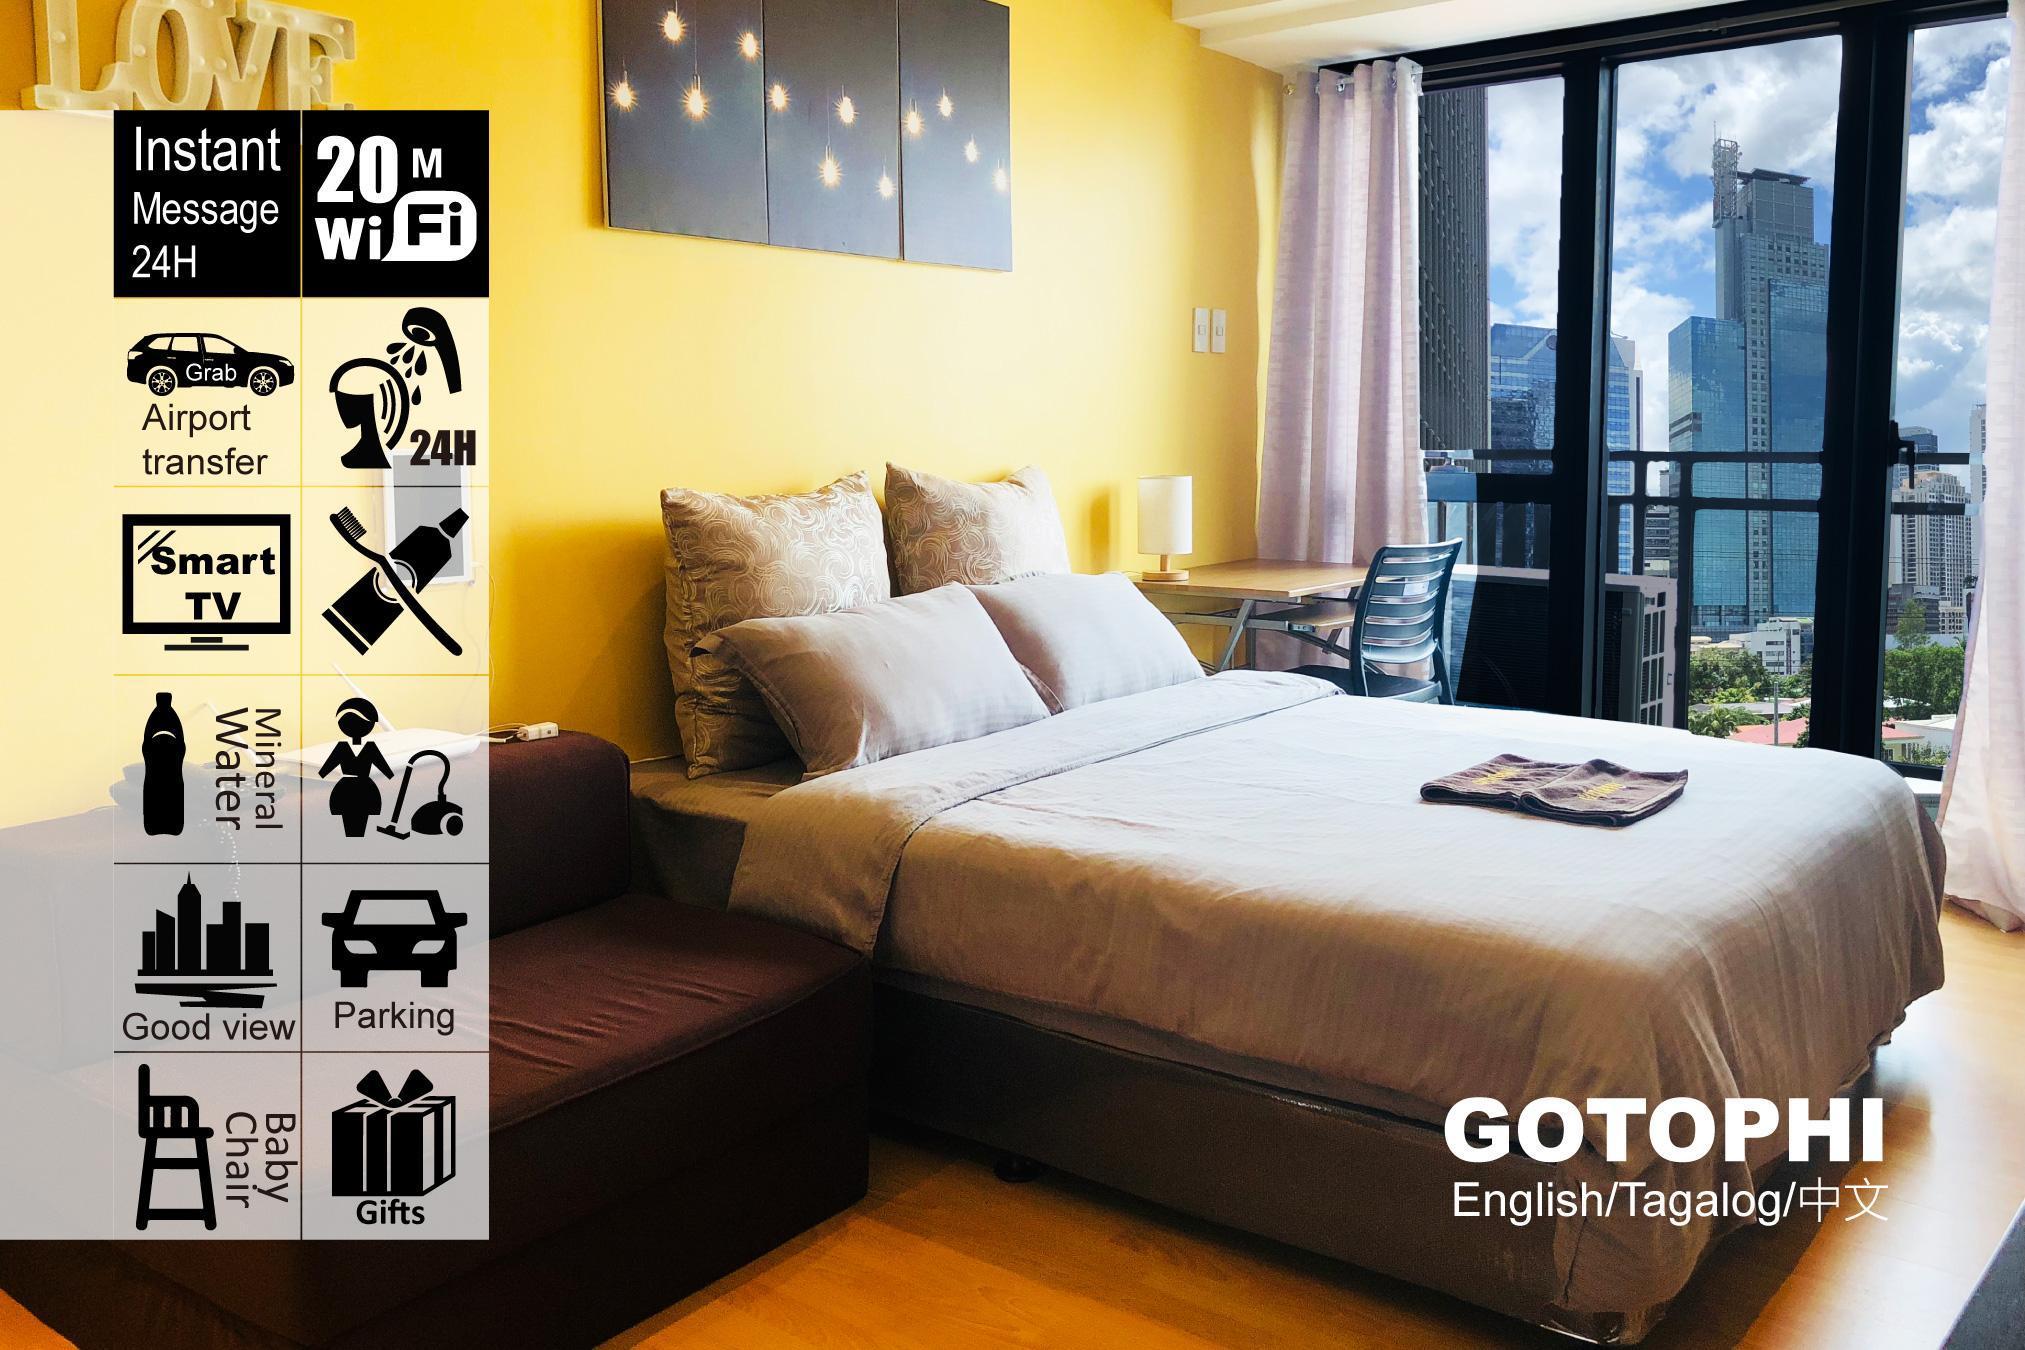 Gotophi Luxurious Hotel Knightsbridge Makati 2000